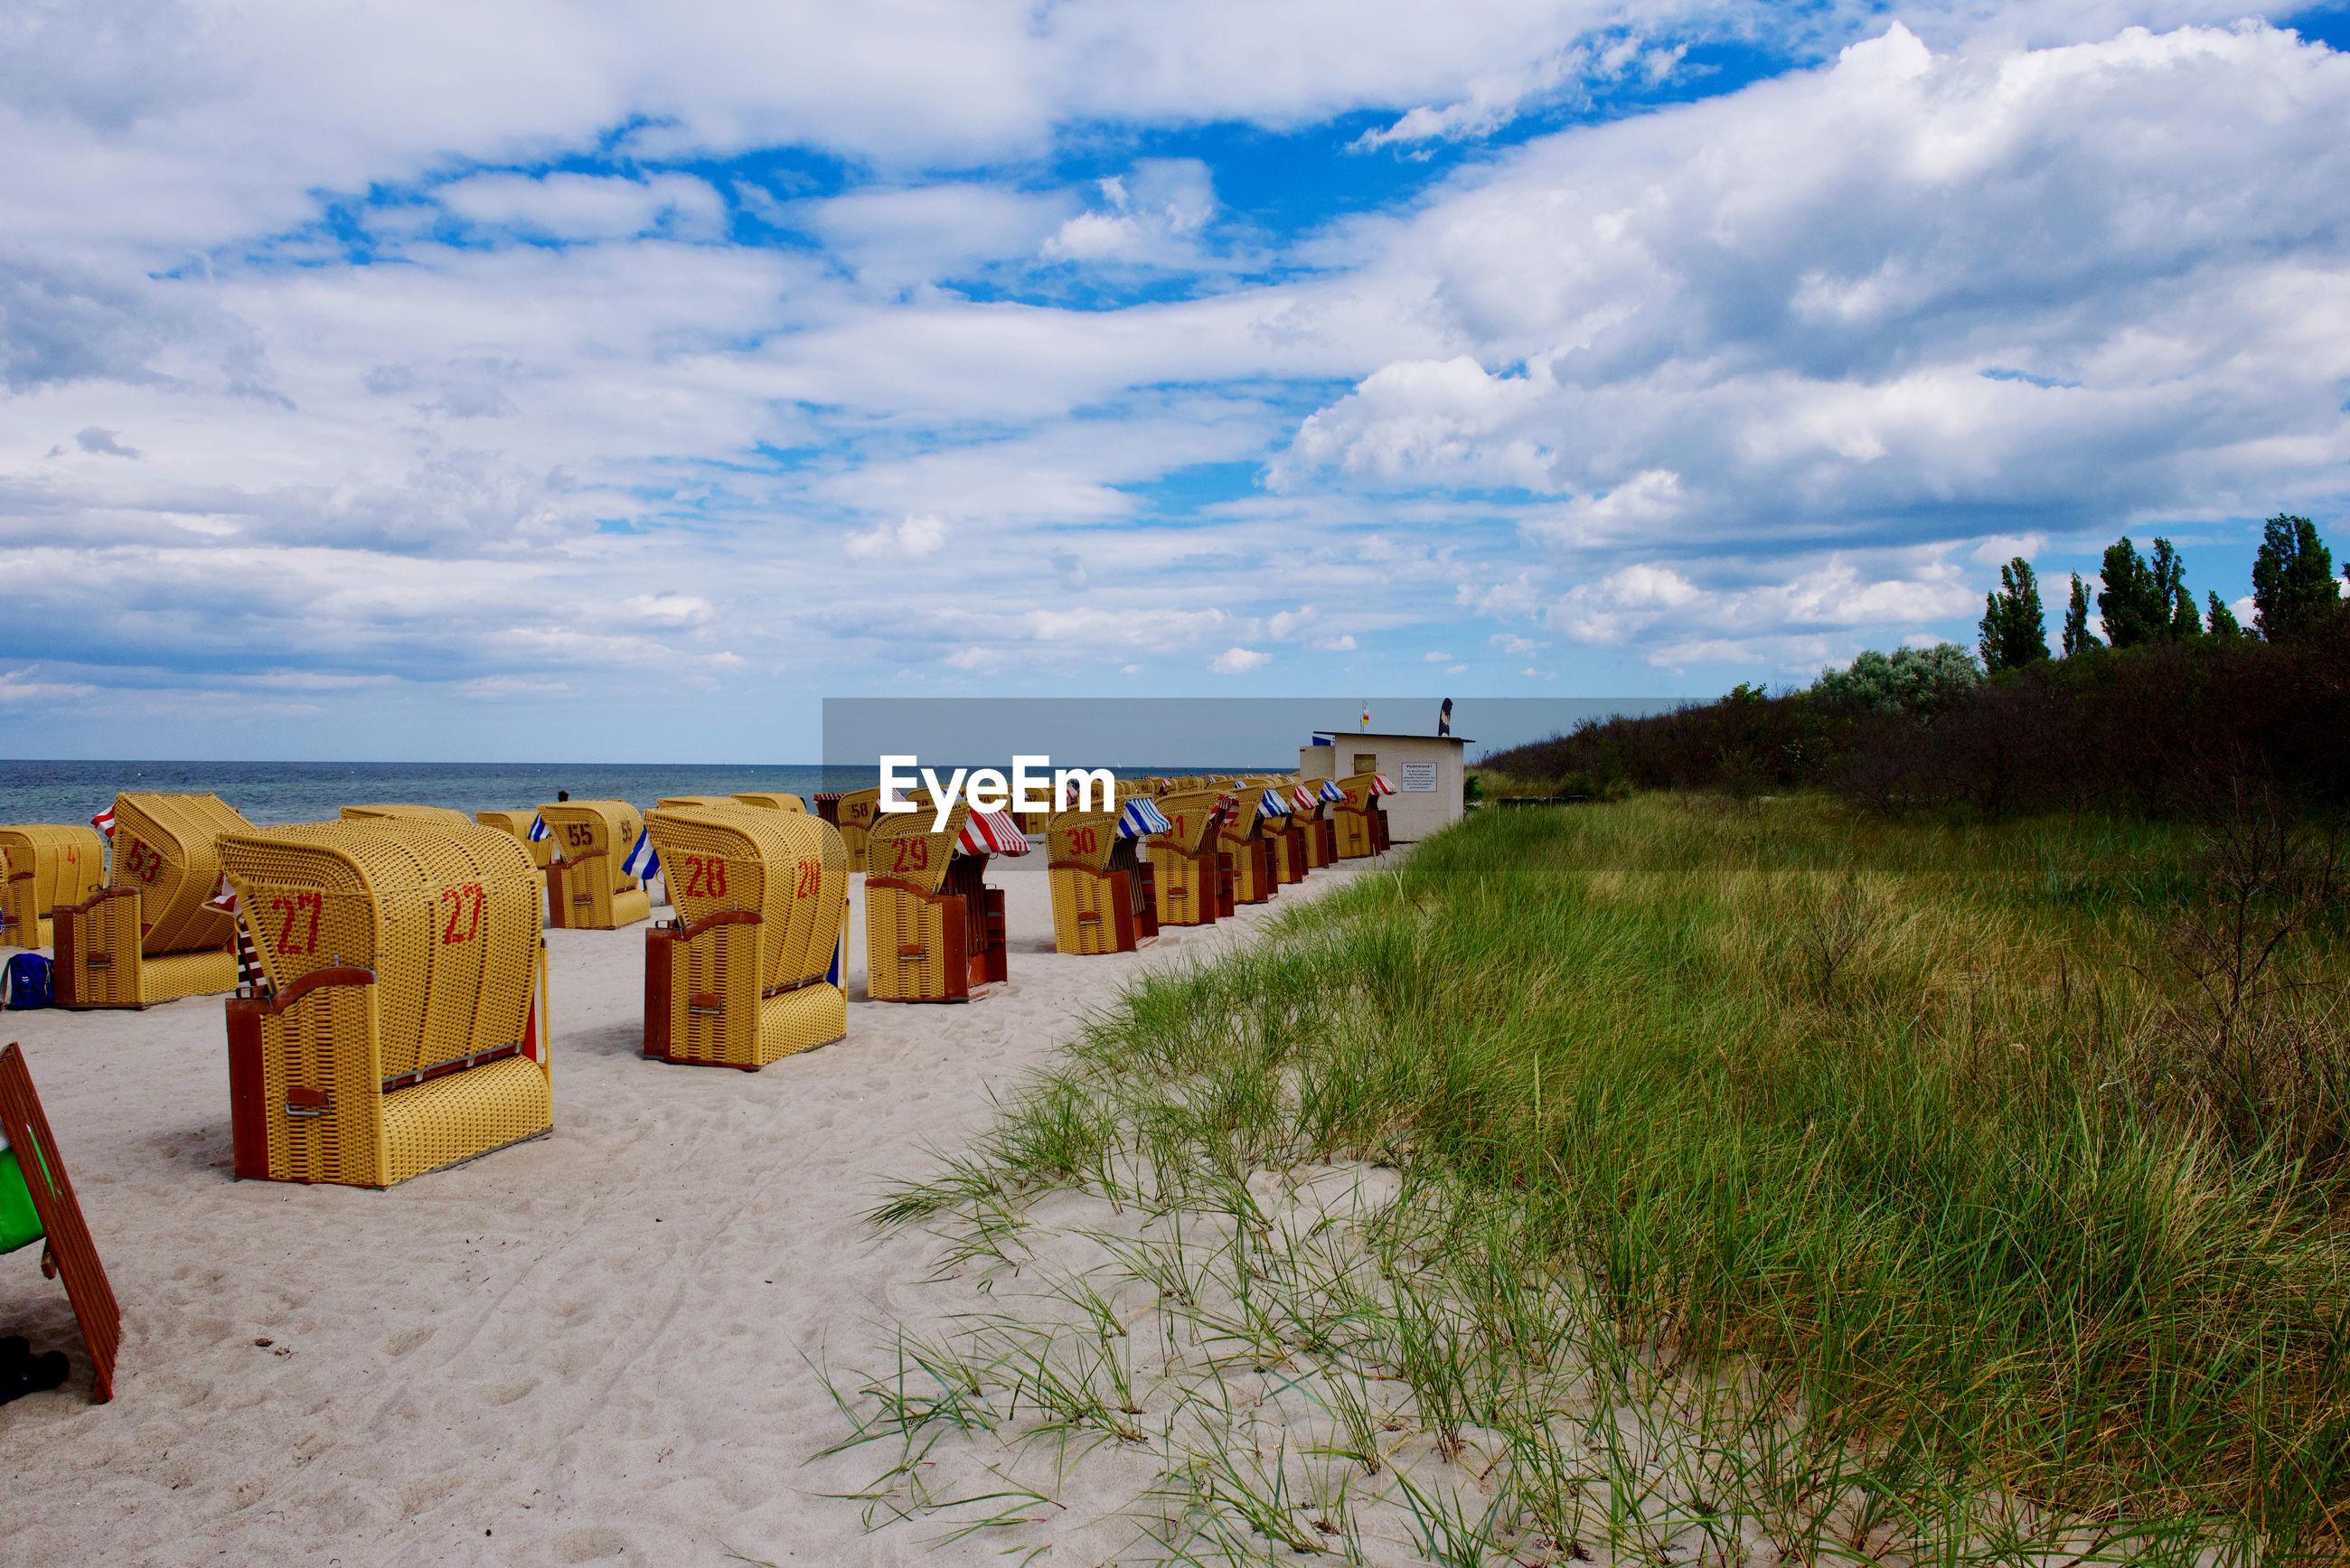 ROW OF HOODED BEACH CHAIRS ON SAND